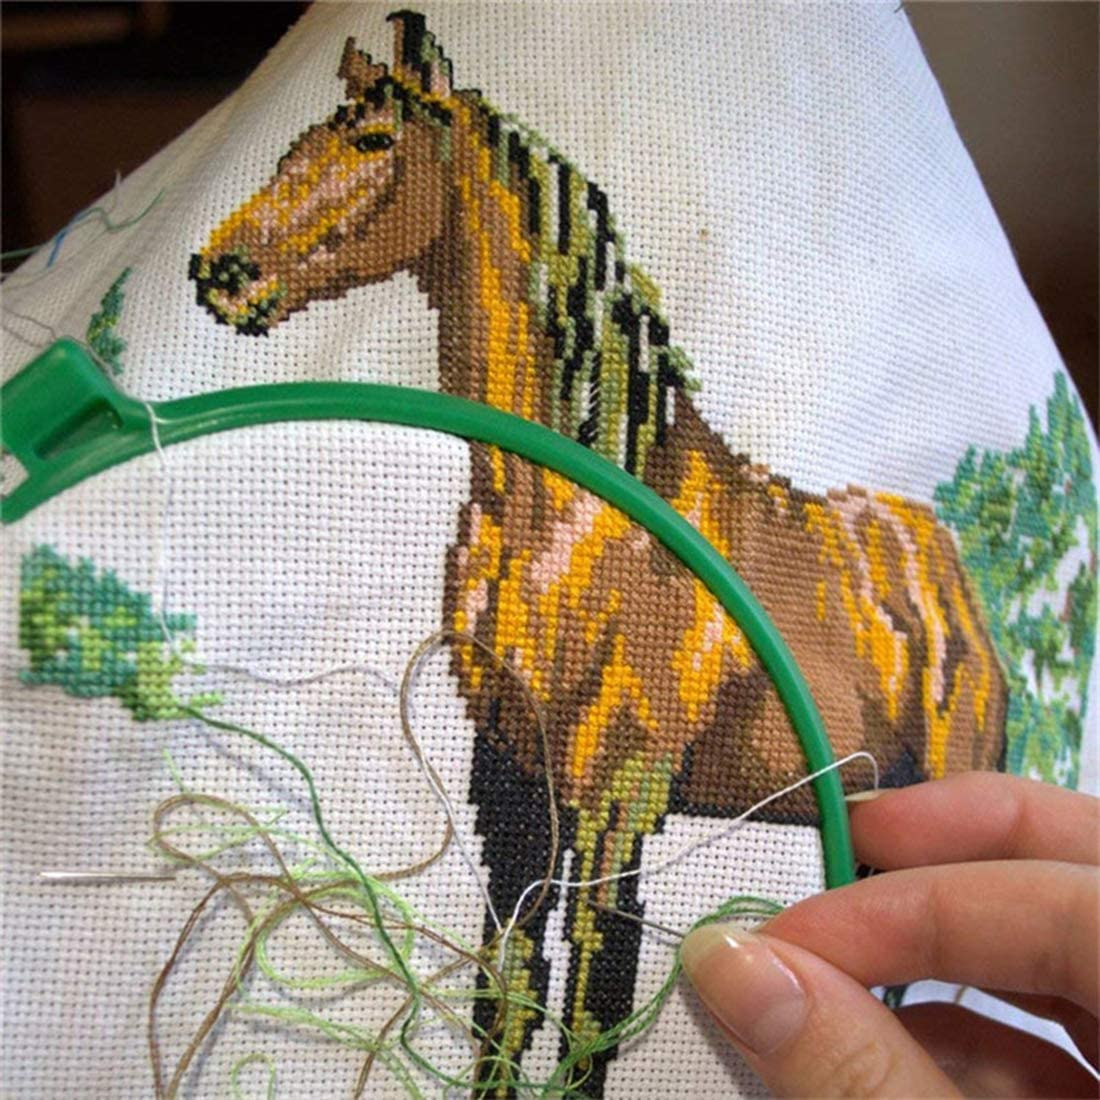 DIY Craft FineInno 6 Pieces Aida Cloth 14 Count Cross-Stitch Fabric White Needlework Fabric for Embroidery 18X12 inch 45 X 30 cm